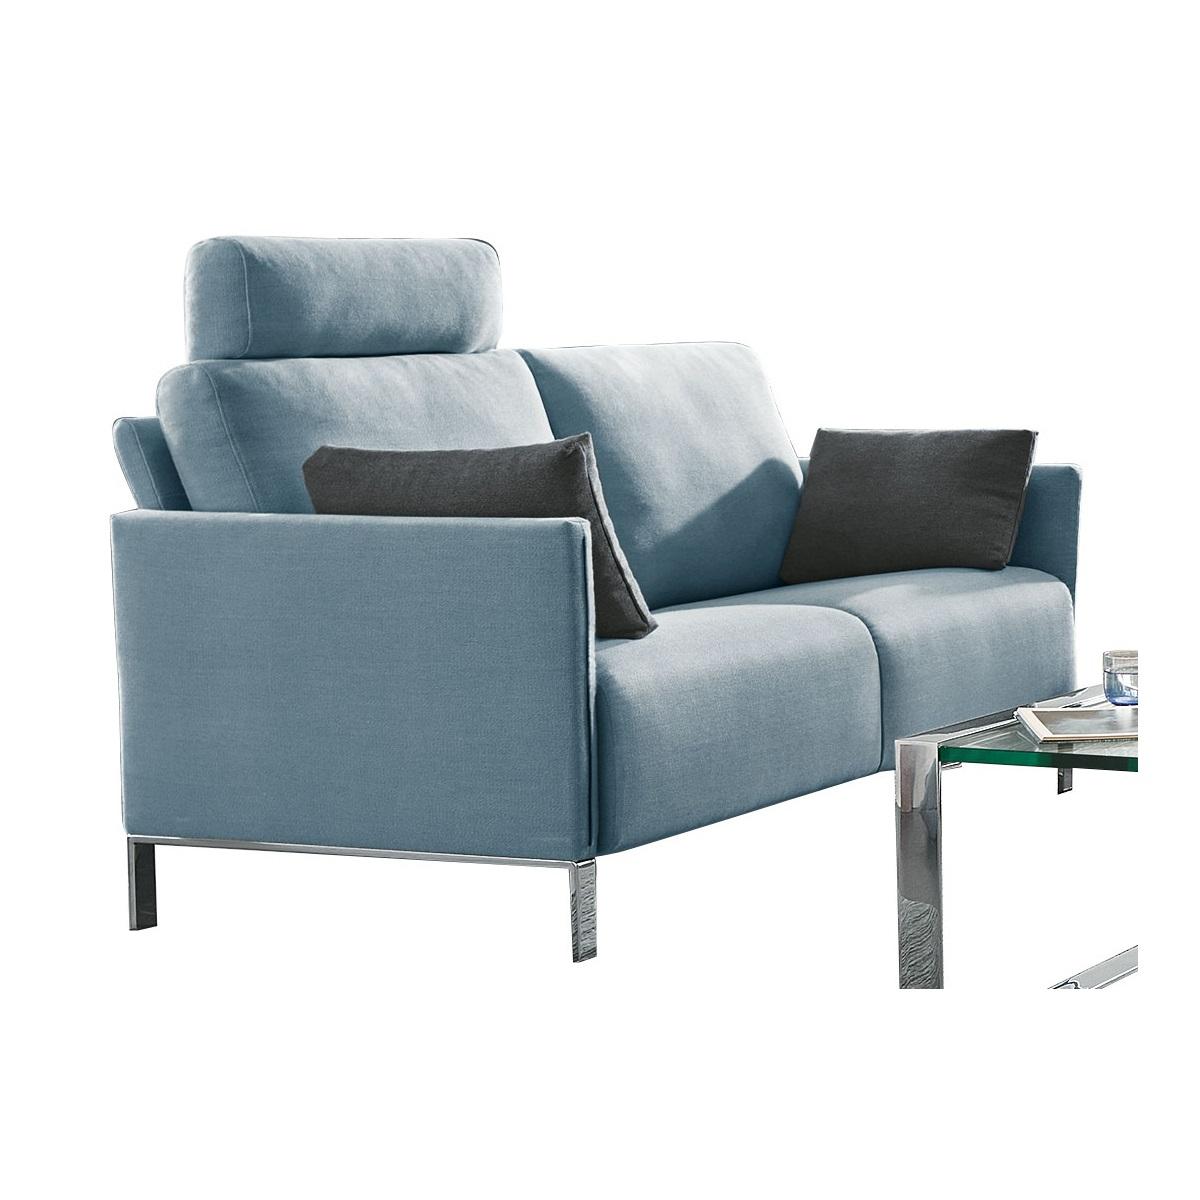 Full Size of Big Sofa Sam Günstig In L Form Stoff Xxl U 3er Grau 2 Sitzer Mit Schlaffunktion Indomo Ohne Lehne Schillig De Sede Hersteller Sofa Erpo Sofa